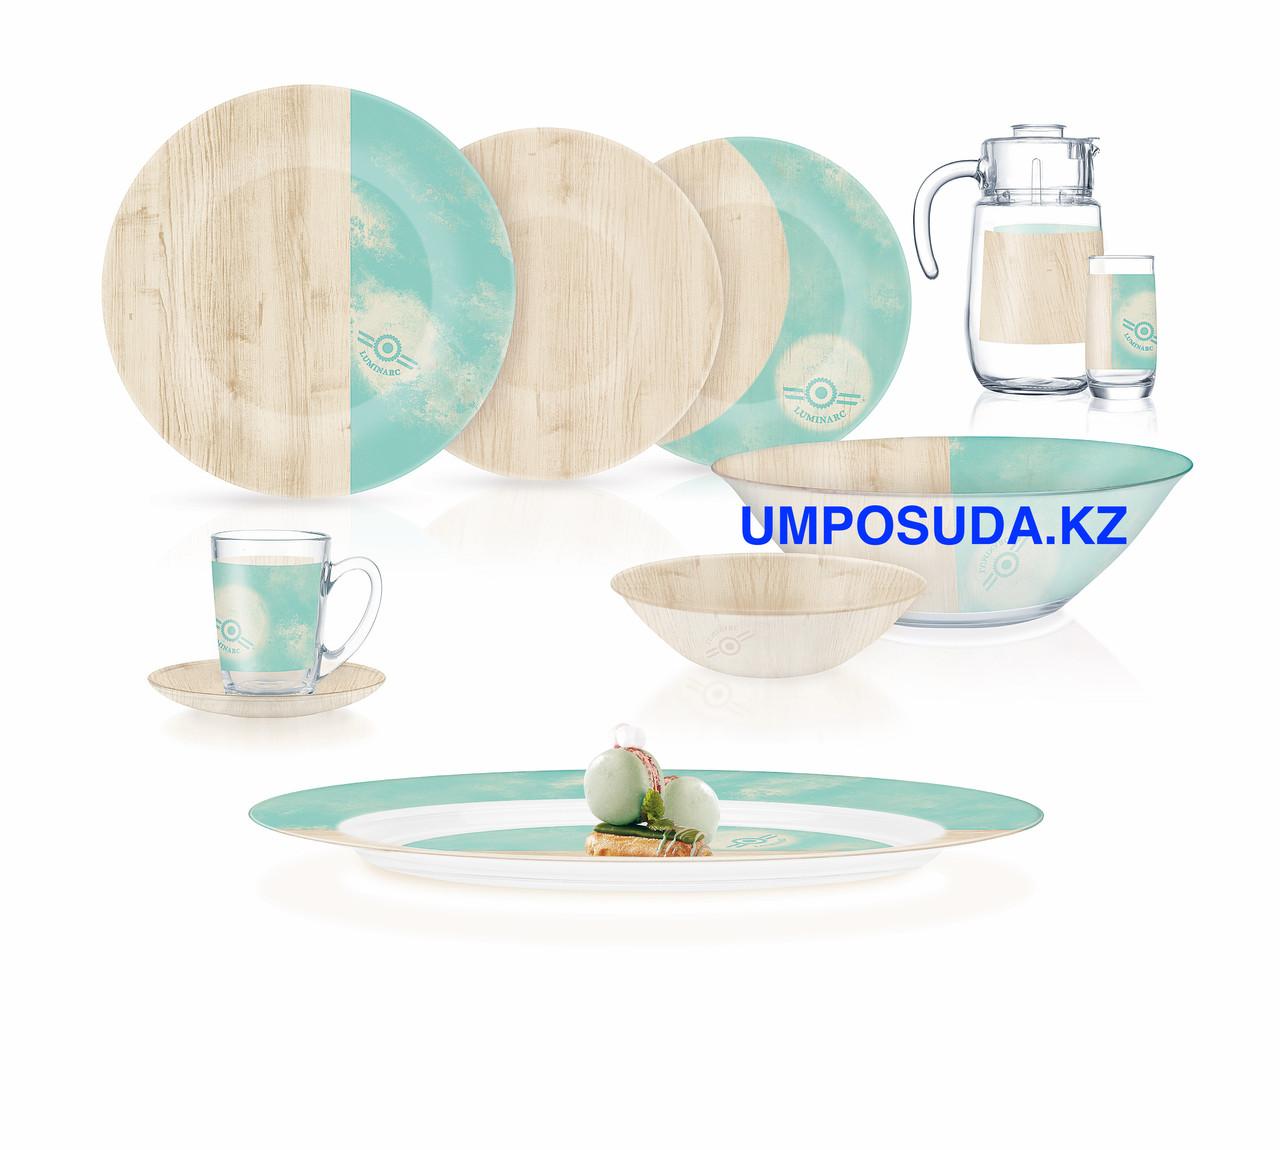 Столовый сервиз Luminarc Nordic Hevea Turquoise 46 предметов